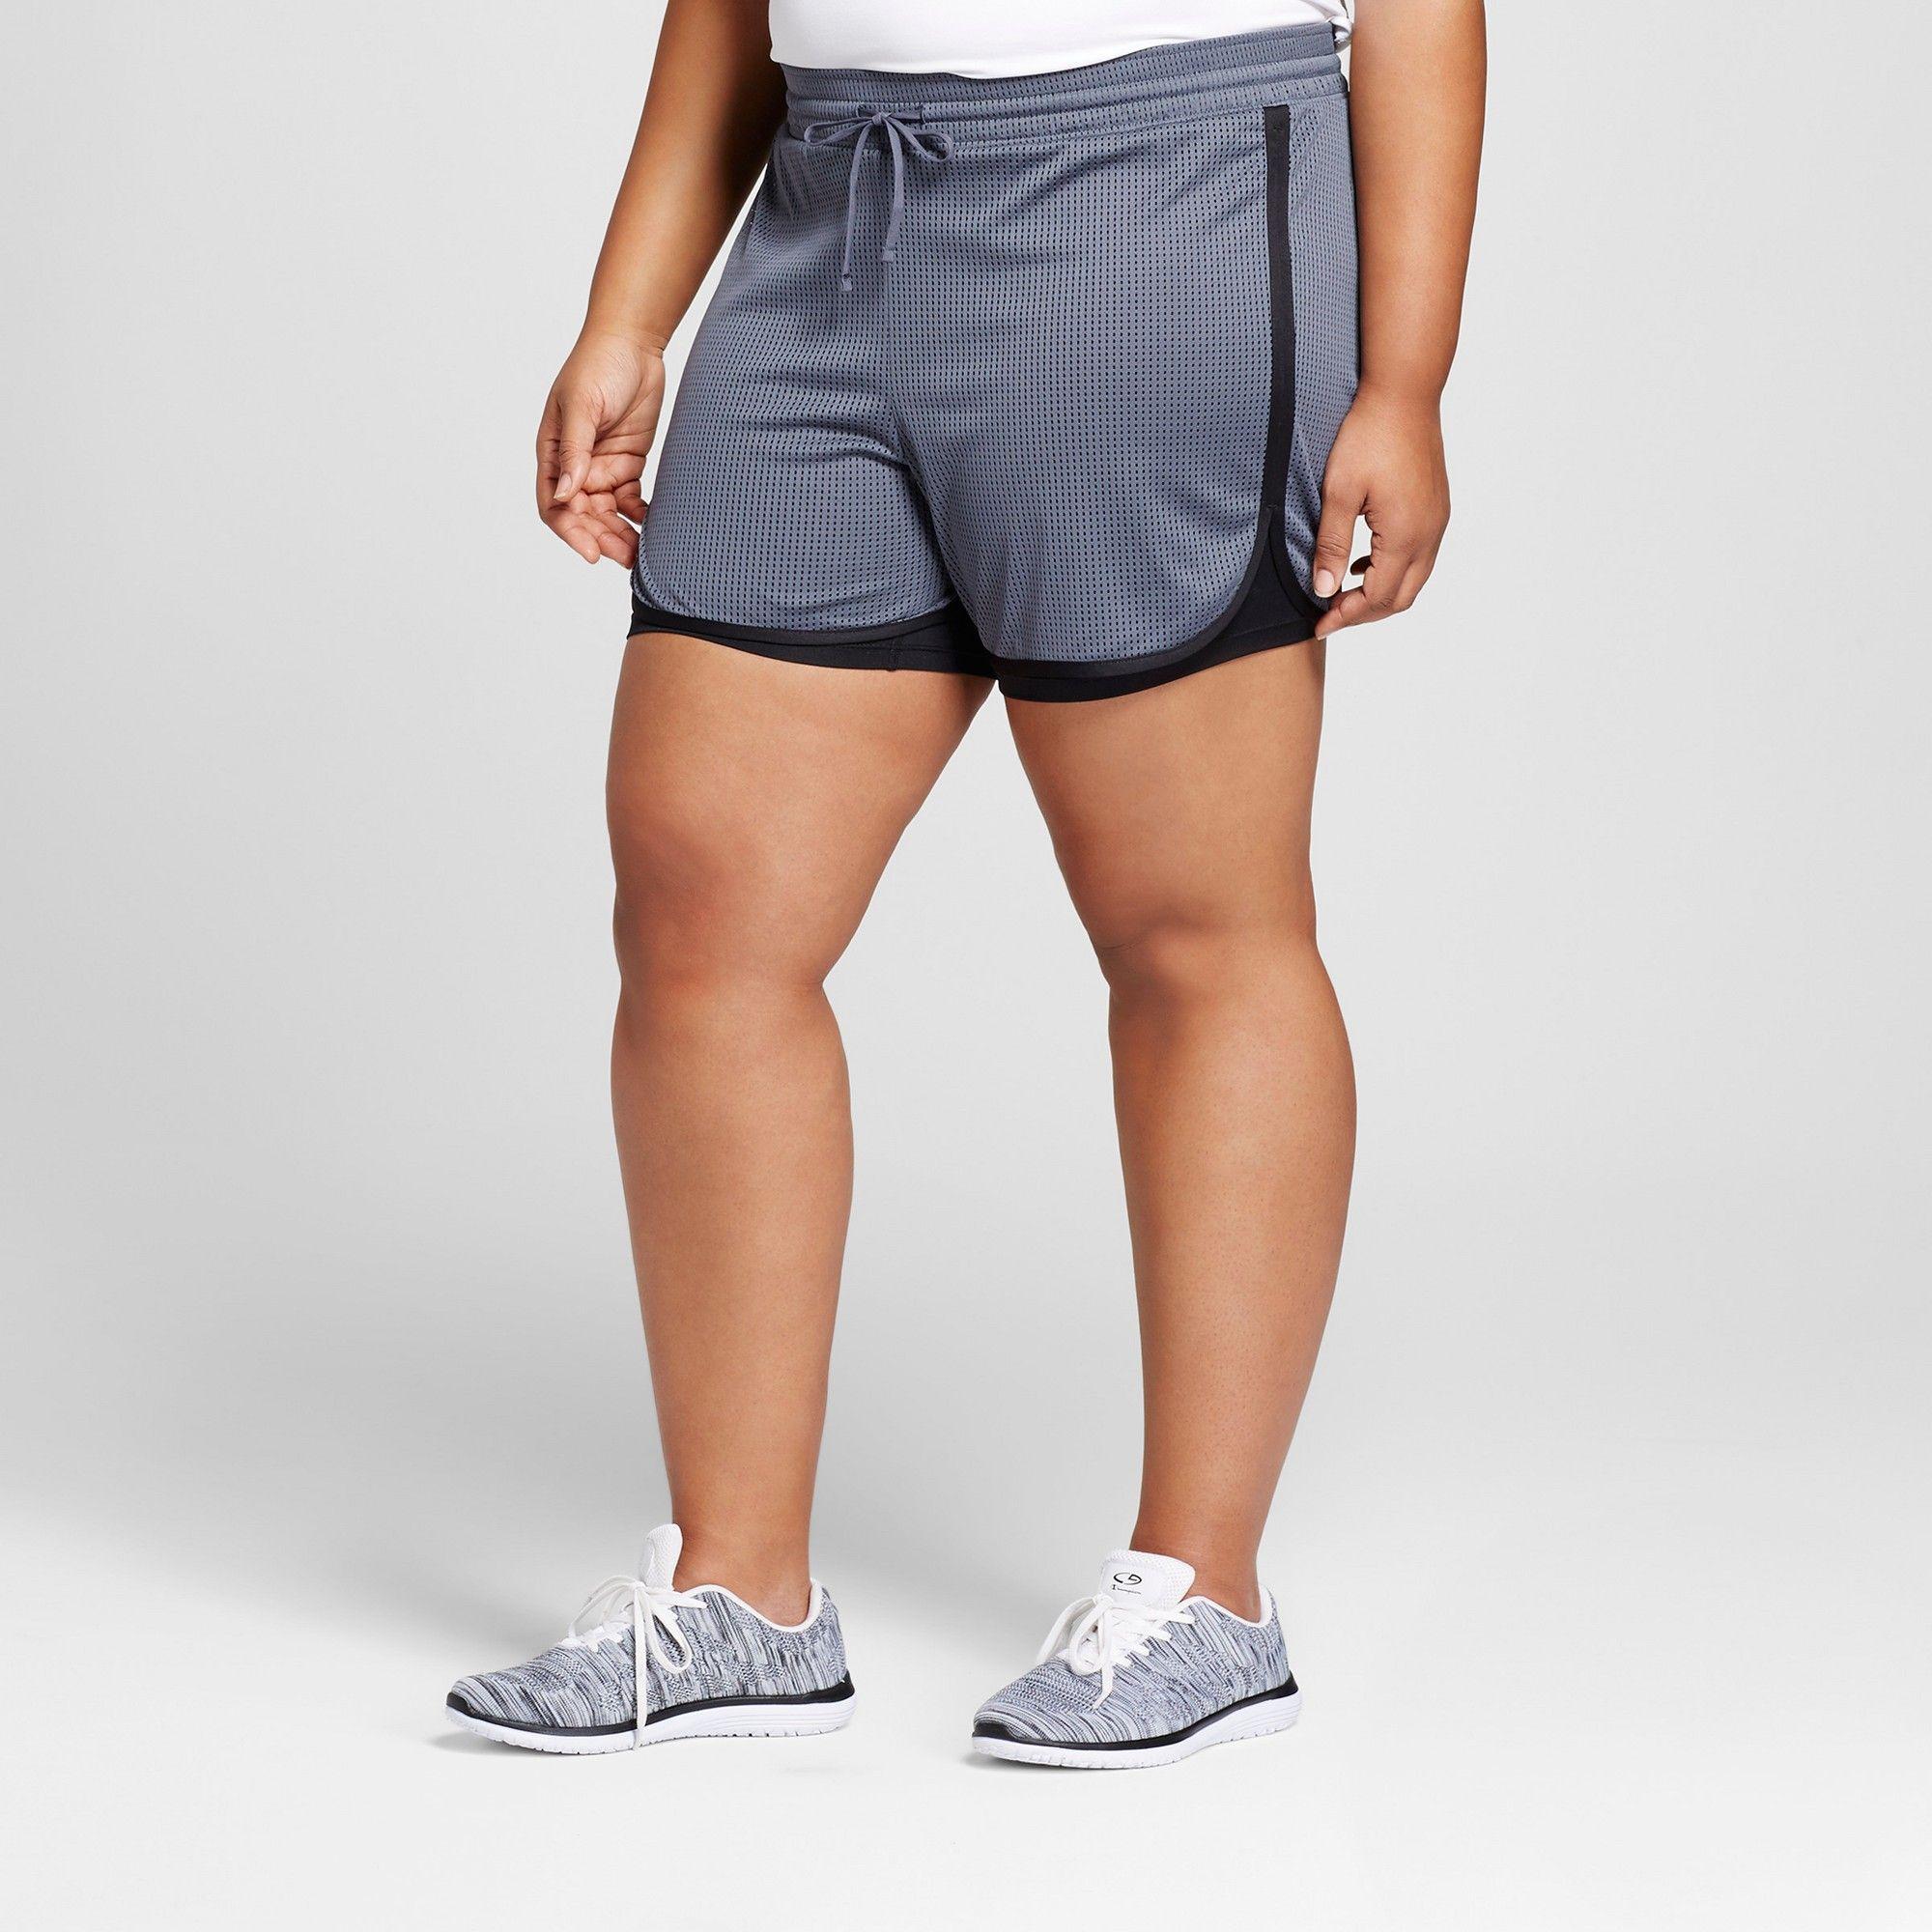 542f3ffa2027 Women s Plus-Size Sport Shorts - C9 Champion Dark Gray 1X